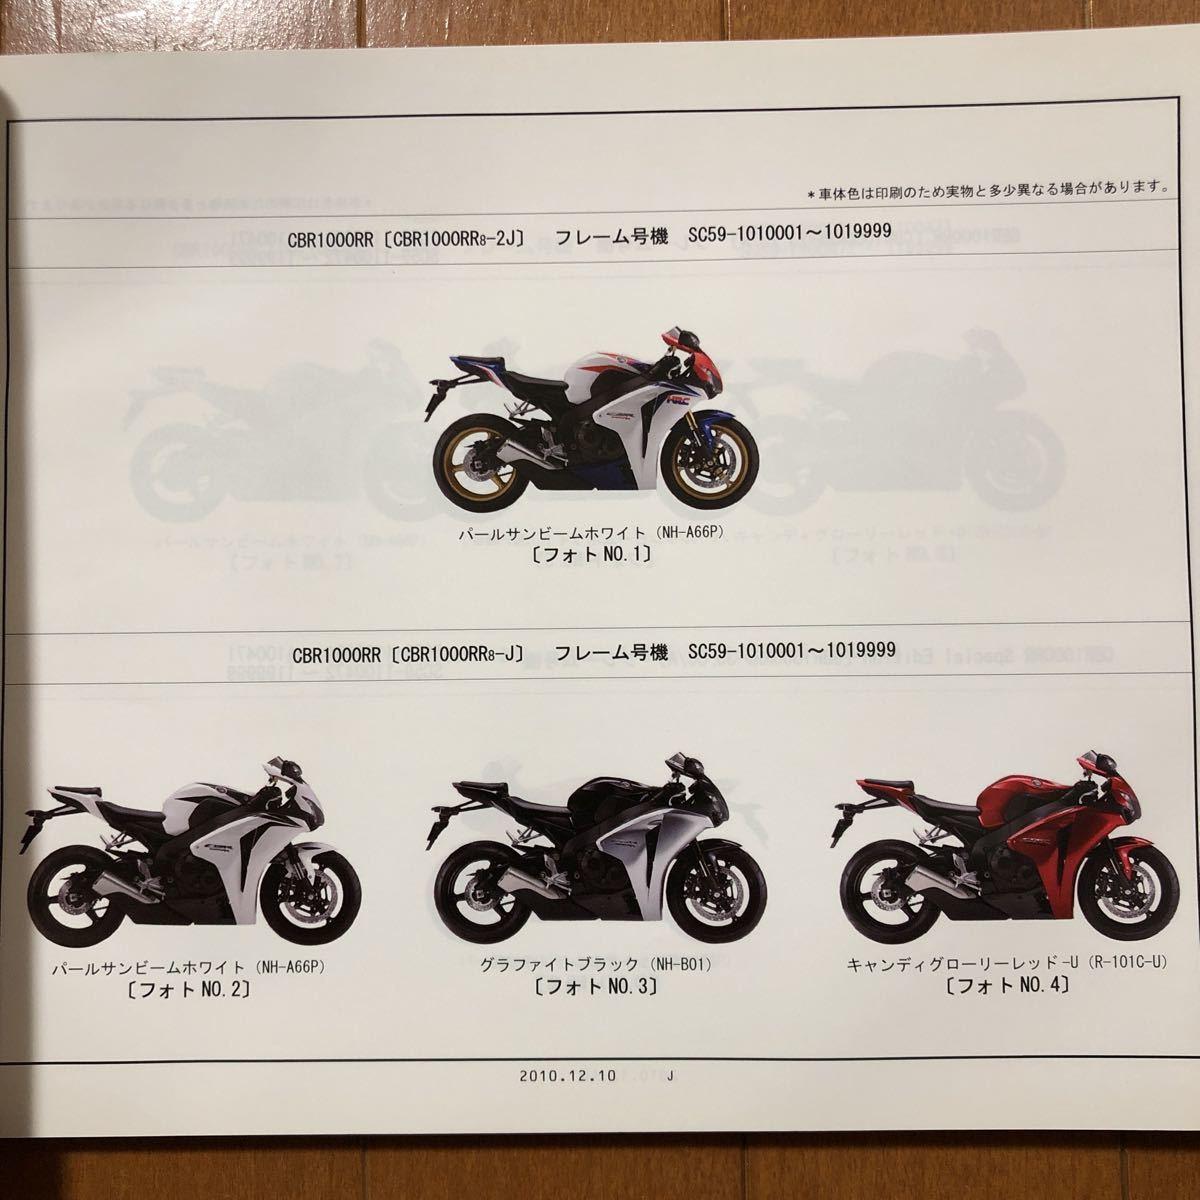 CBR1000RR SC59 パーツカタログ 即決価格で送料無料です_画像3